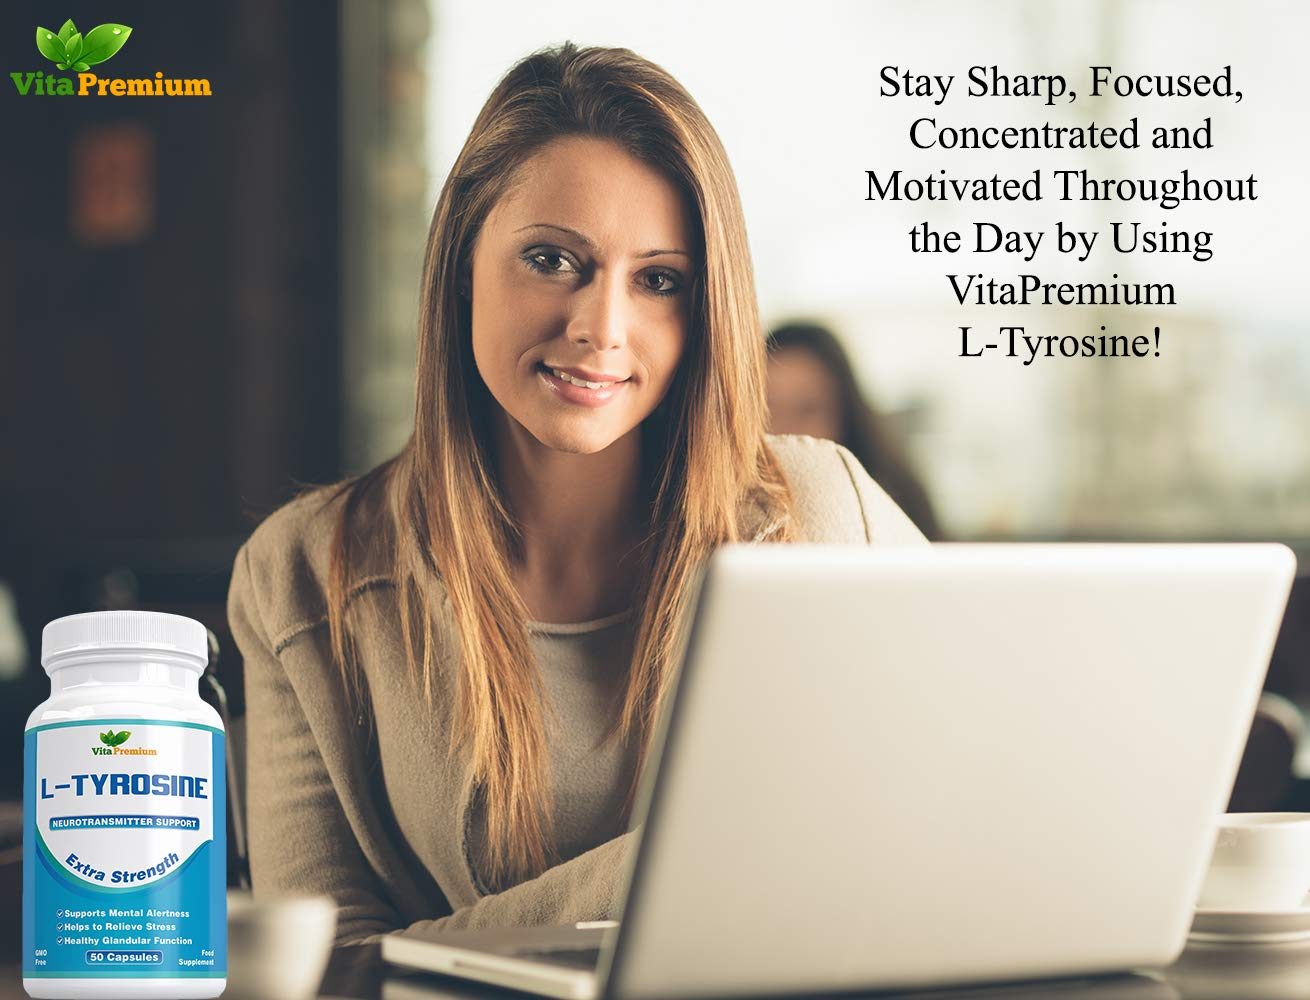 61Zvl6ZMsnL - L-Tyrosine Extra Strength, Amino Acids, 50 Veggie Capsules by Vita Premium